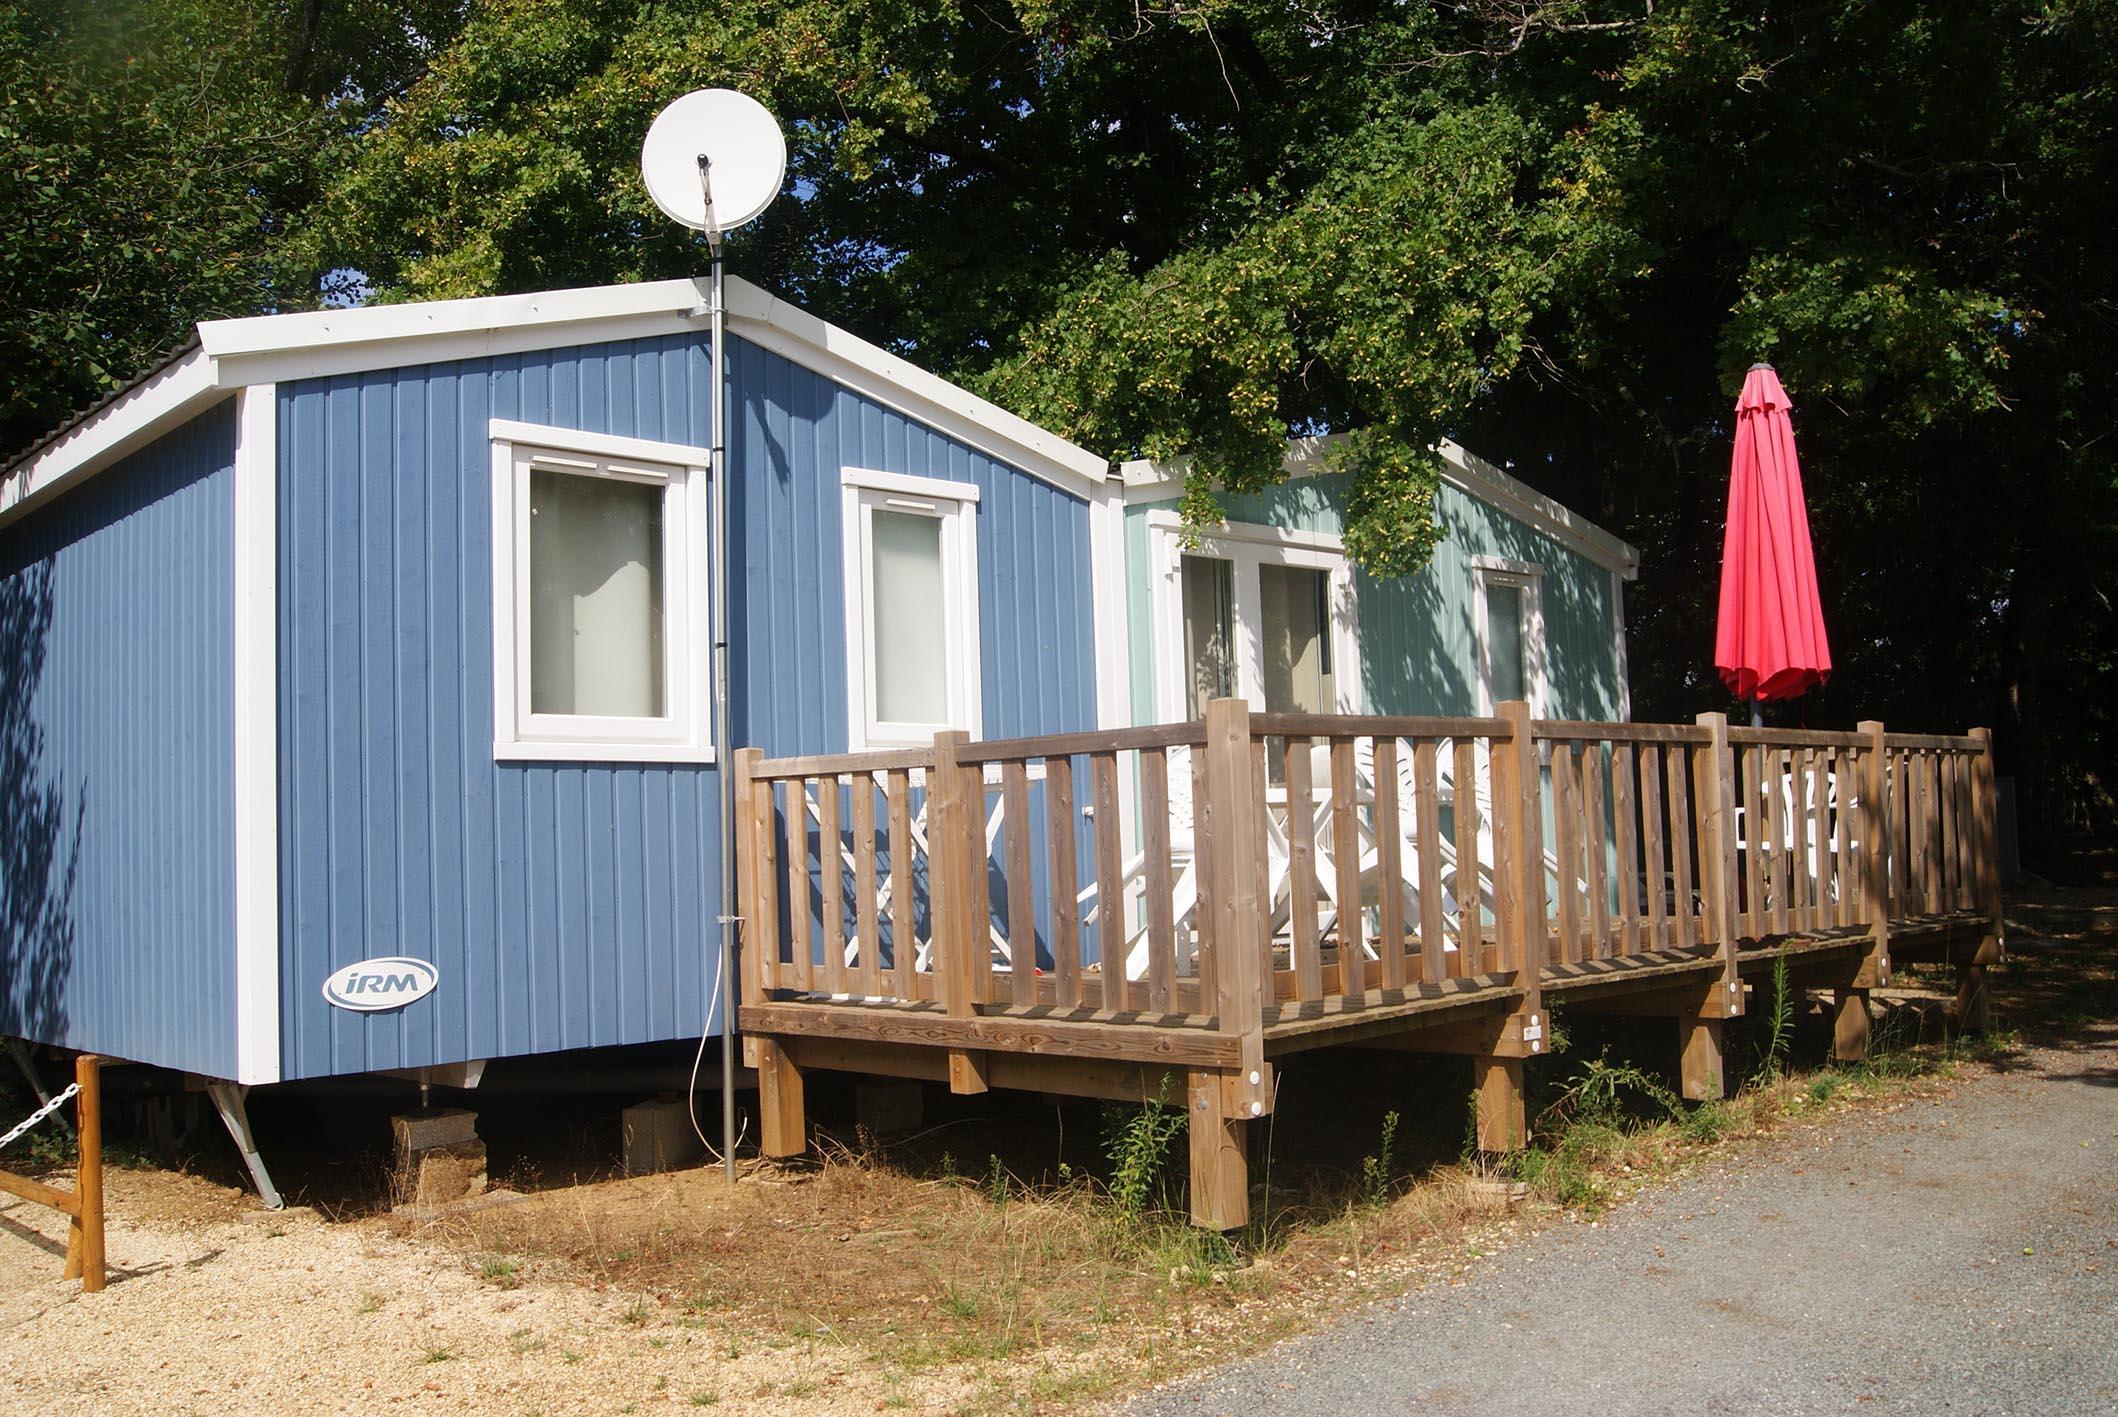 Location - Mobil-Home Premium 35M² (3 Chambres) Côté Étang - Camping Les Étangs Mina